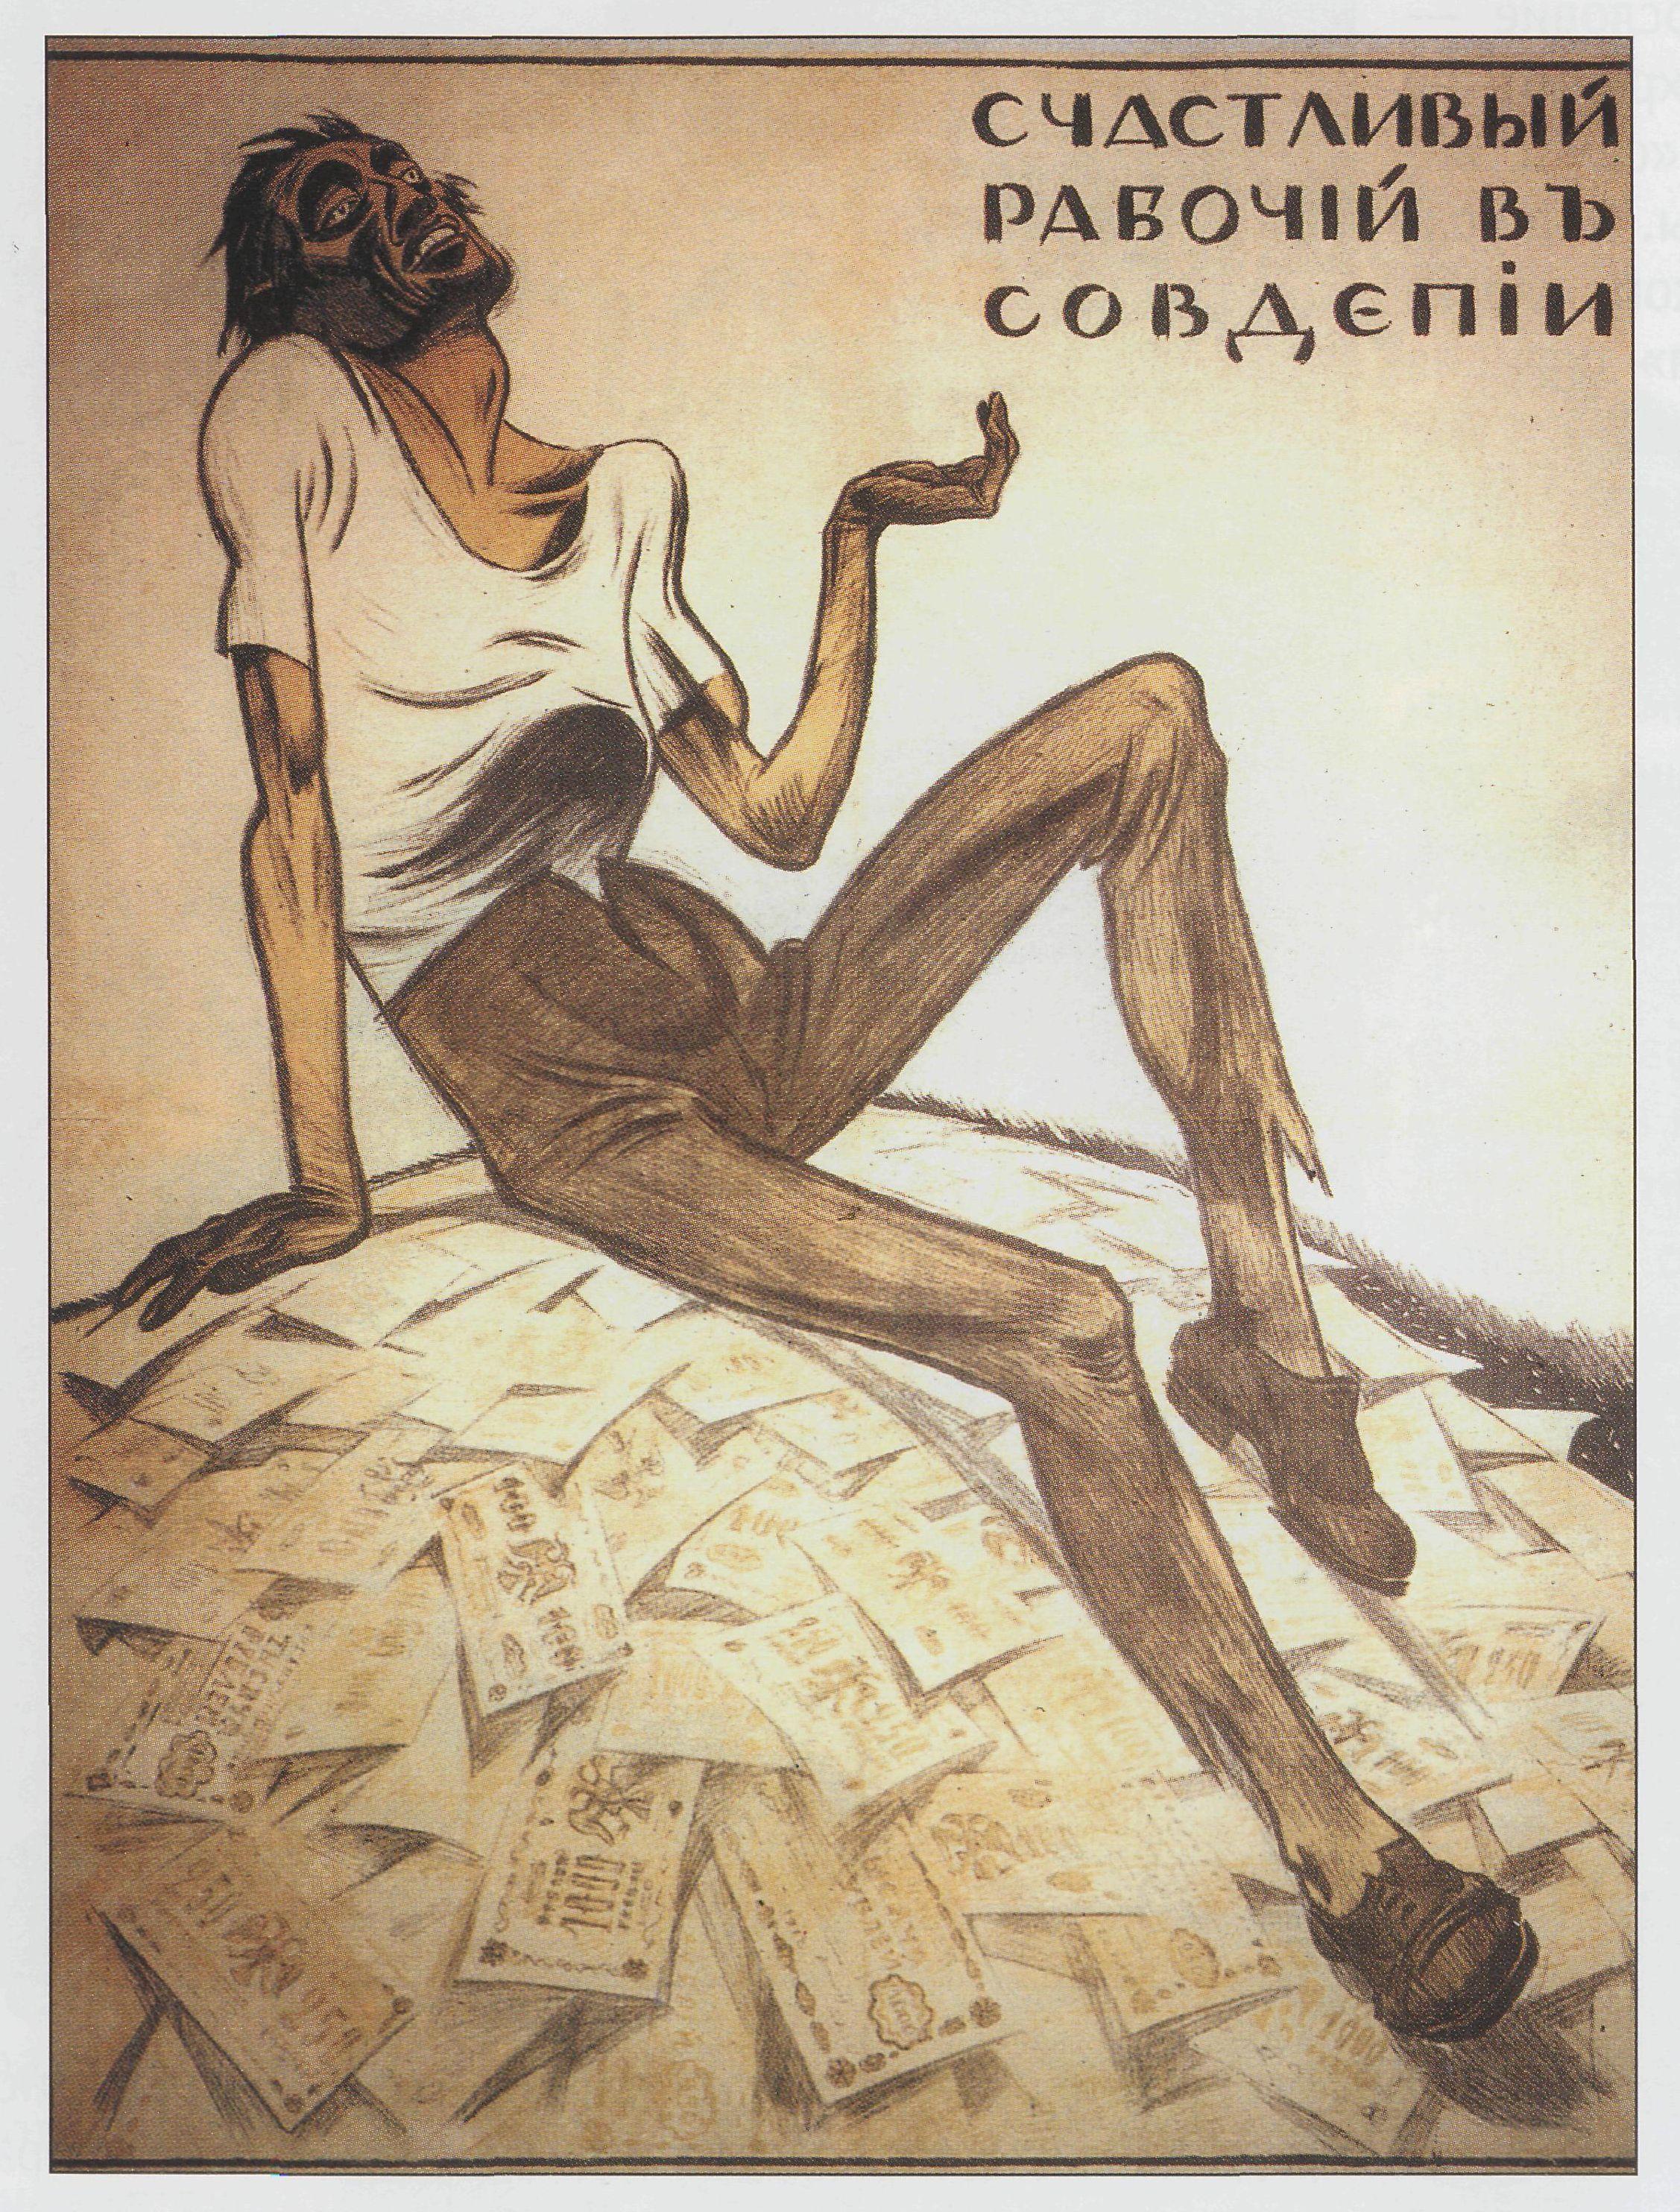 Старые плакаты, плакаты и постеры 1921, старинные ретро плакаты, постеры...